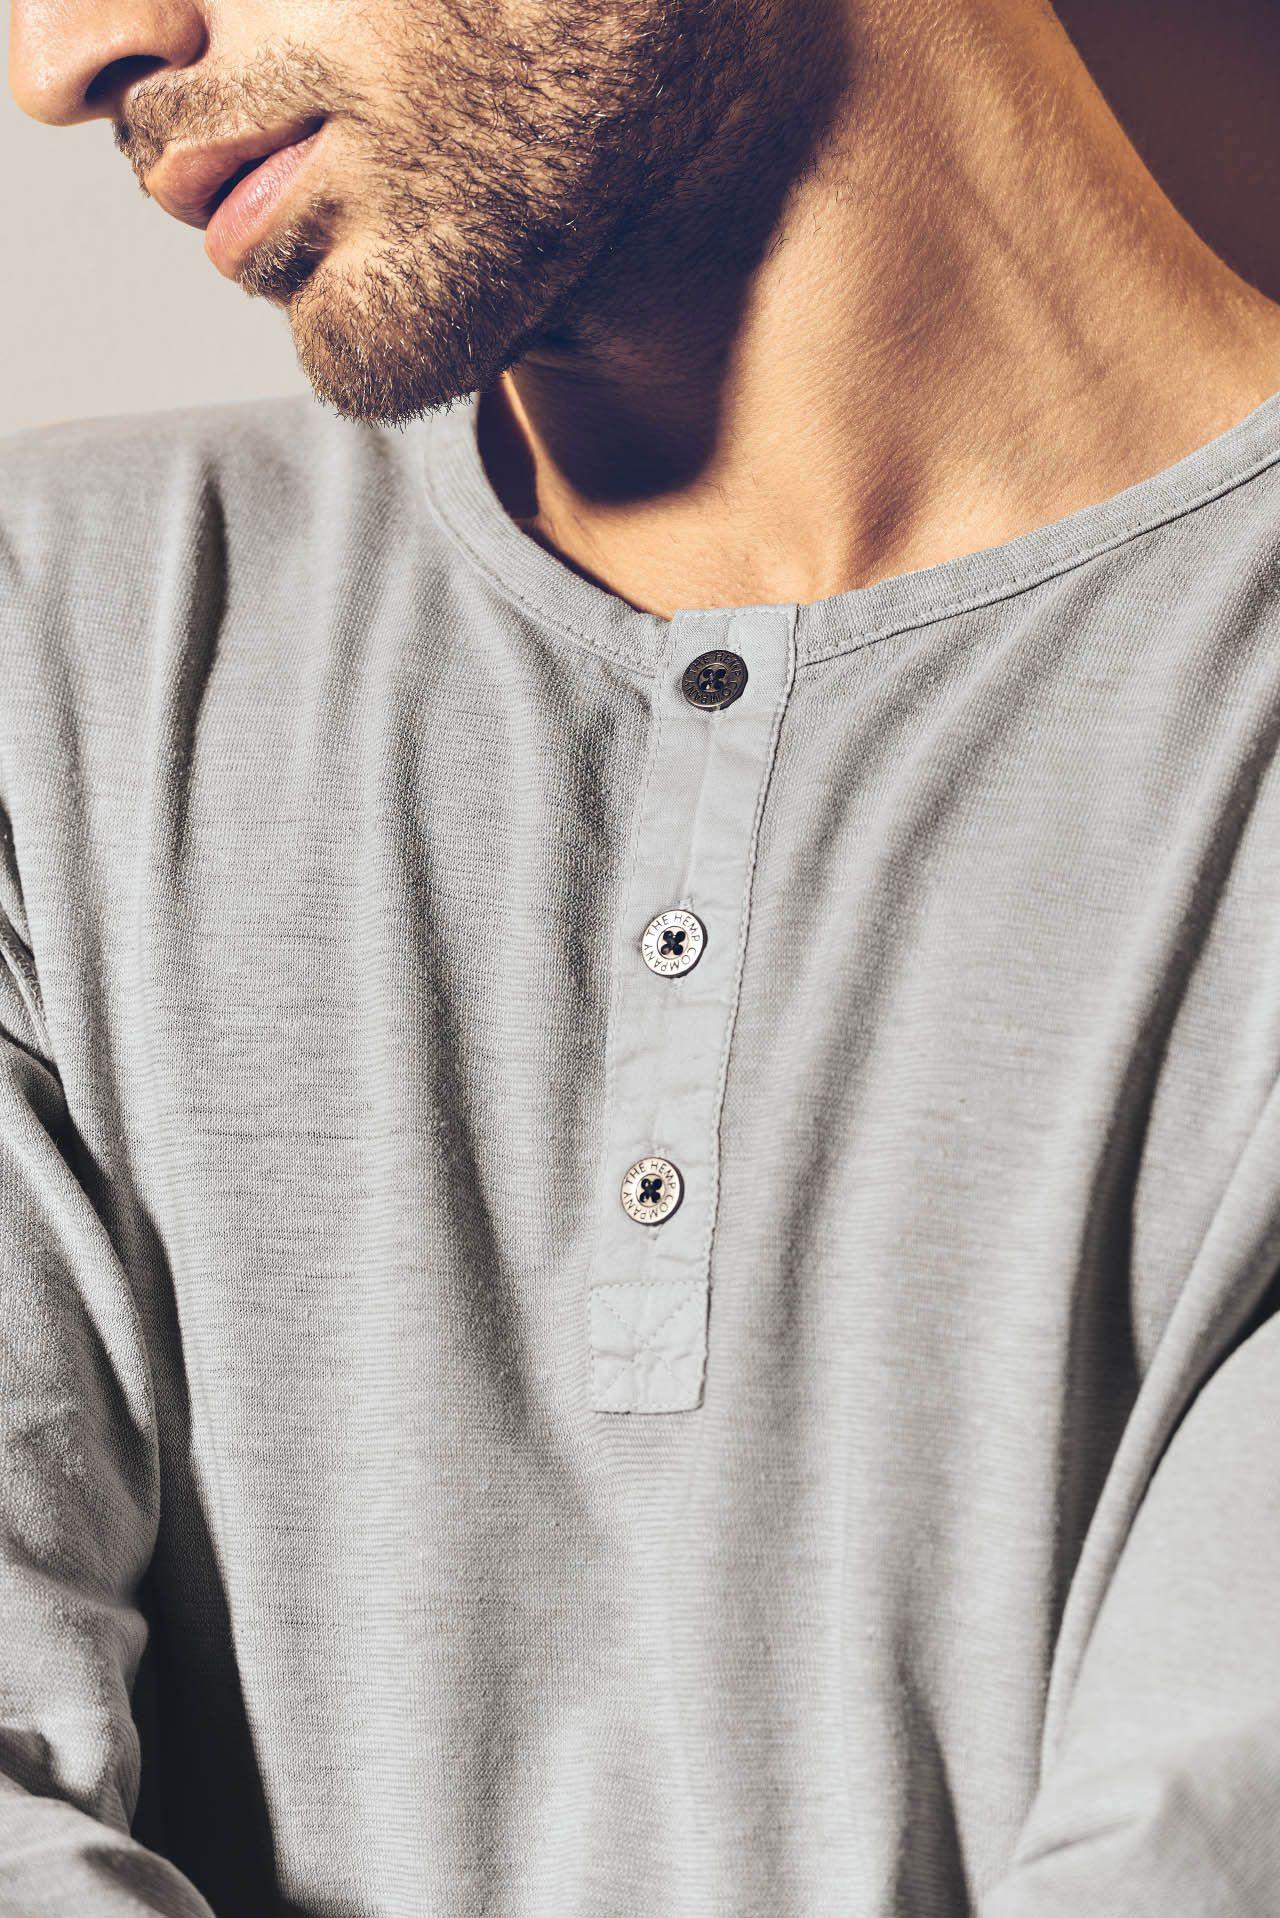 Detalle camiseta manga larga hombre con botones